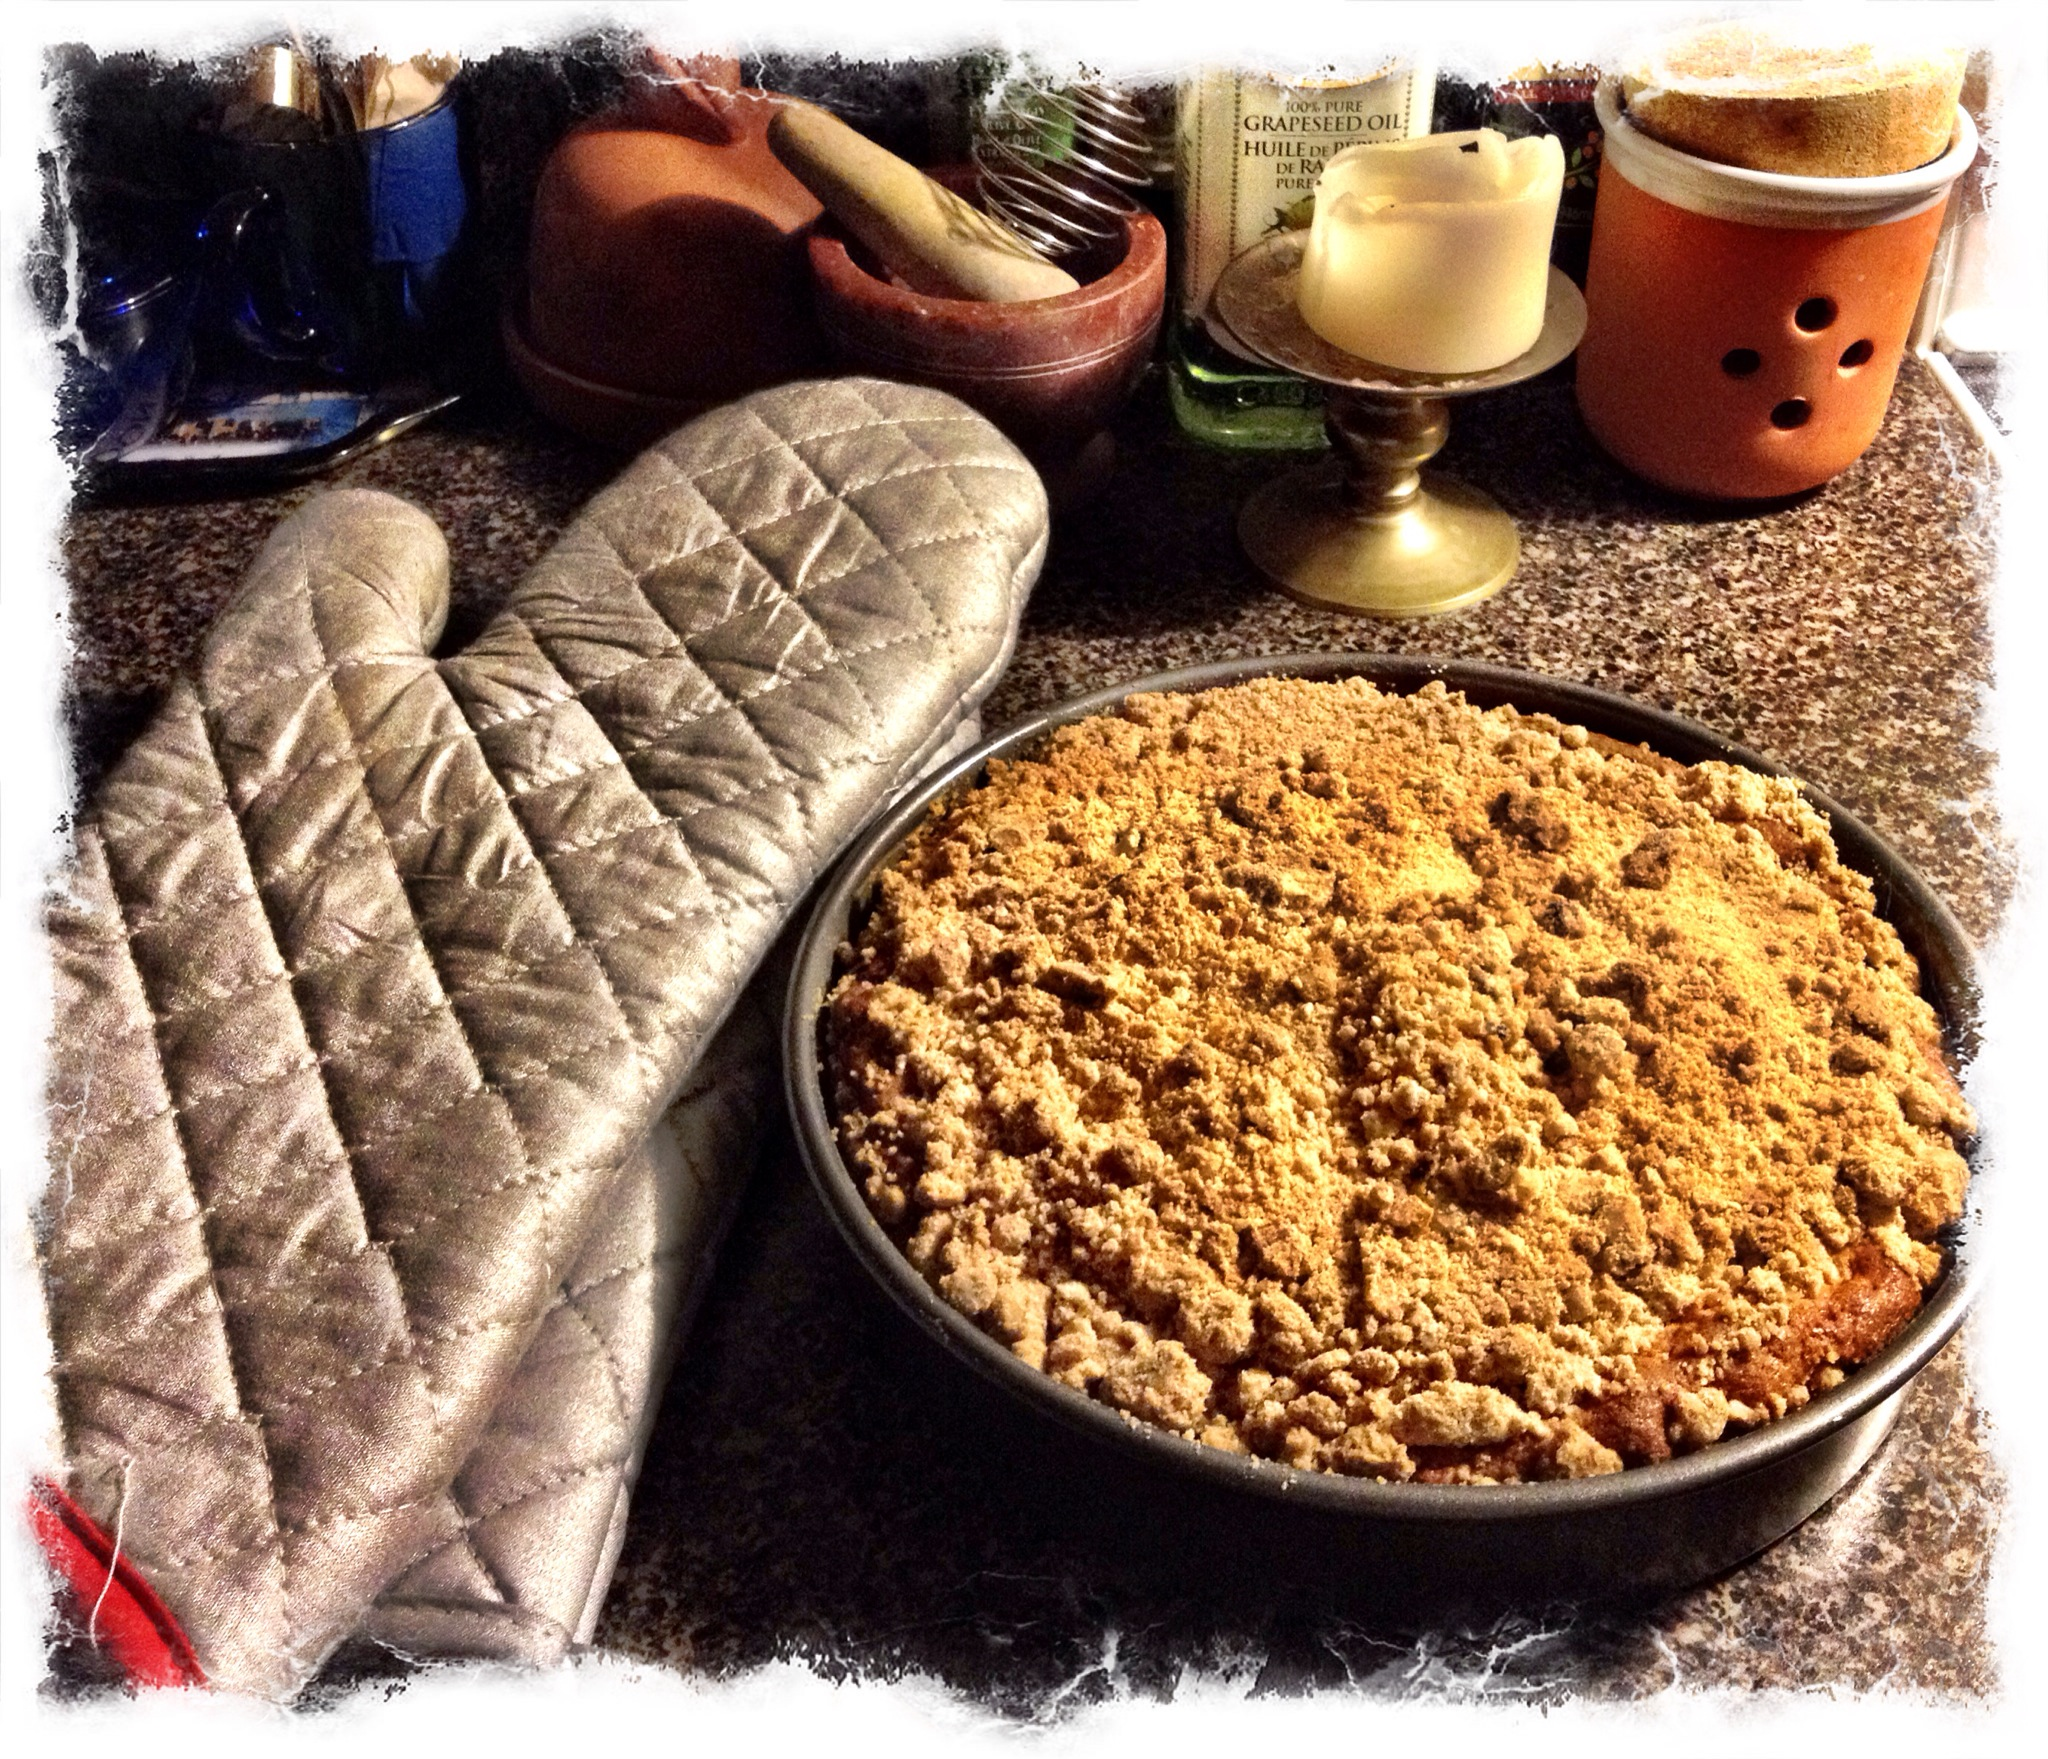 Ina Garten Address Blueberry Crumb Cake The Artsy Fartsy Chick